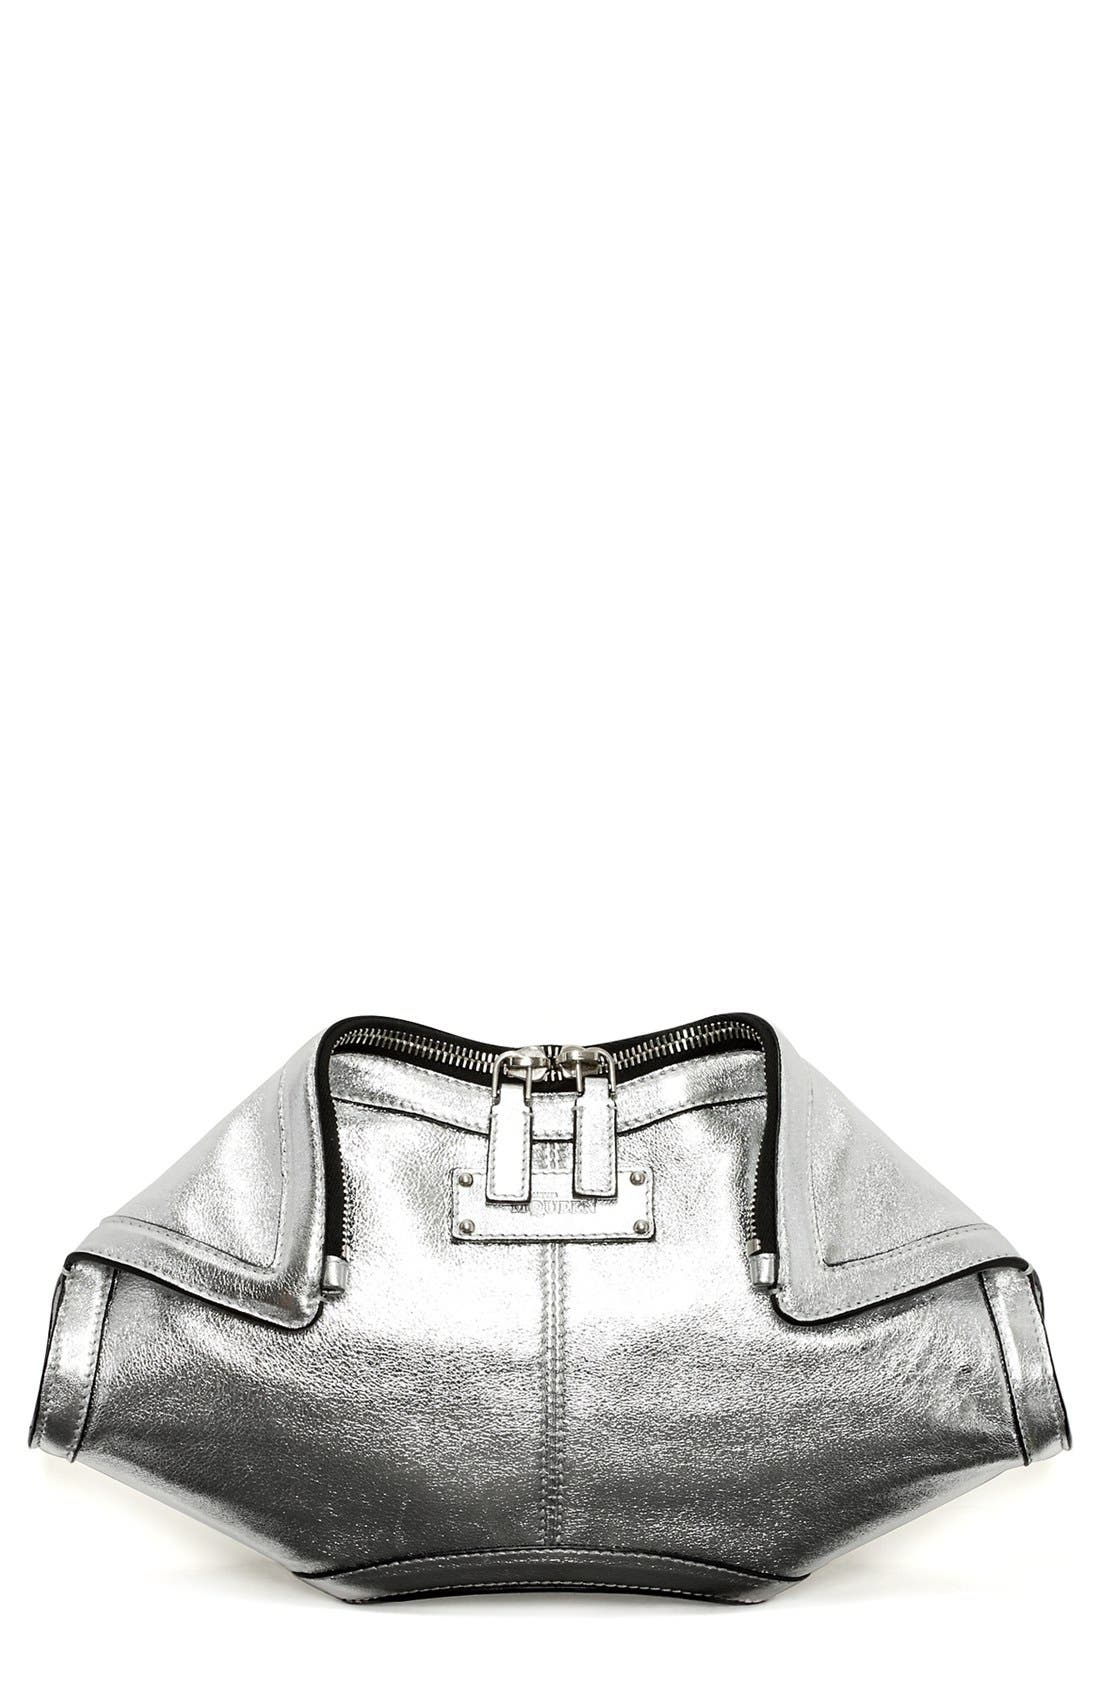 Alternate Image 1 Selected - Alexander McQueen 'De Manta - Small' Metallic Clutch